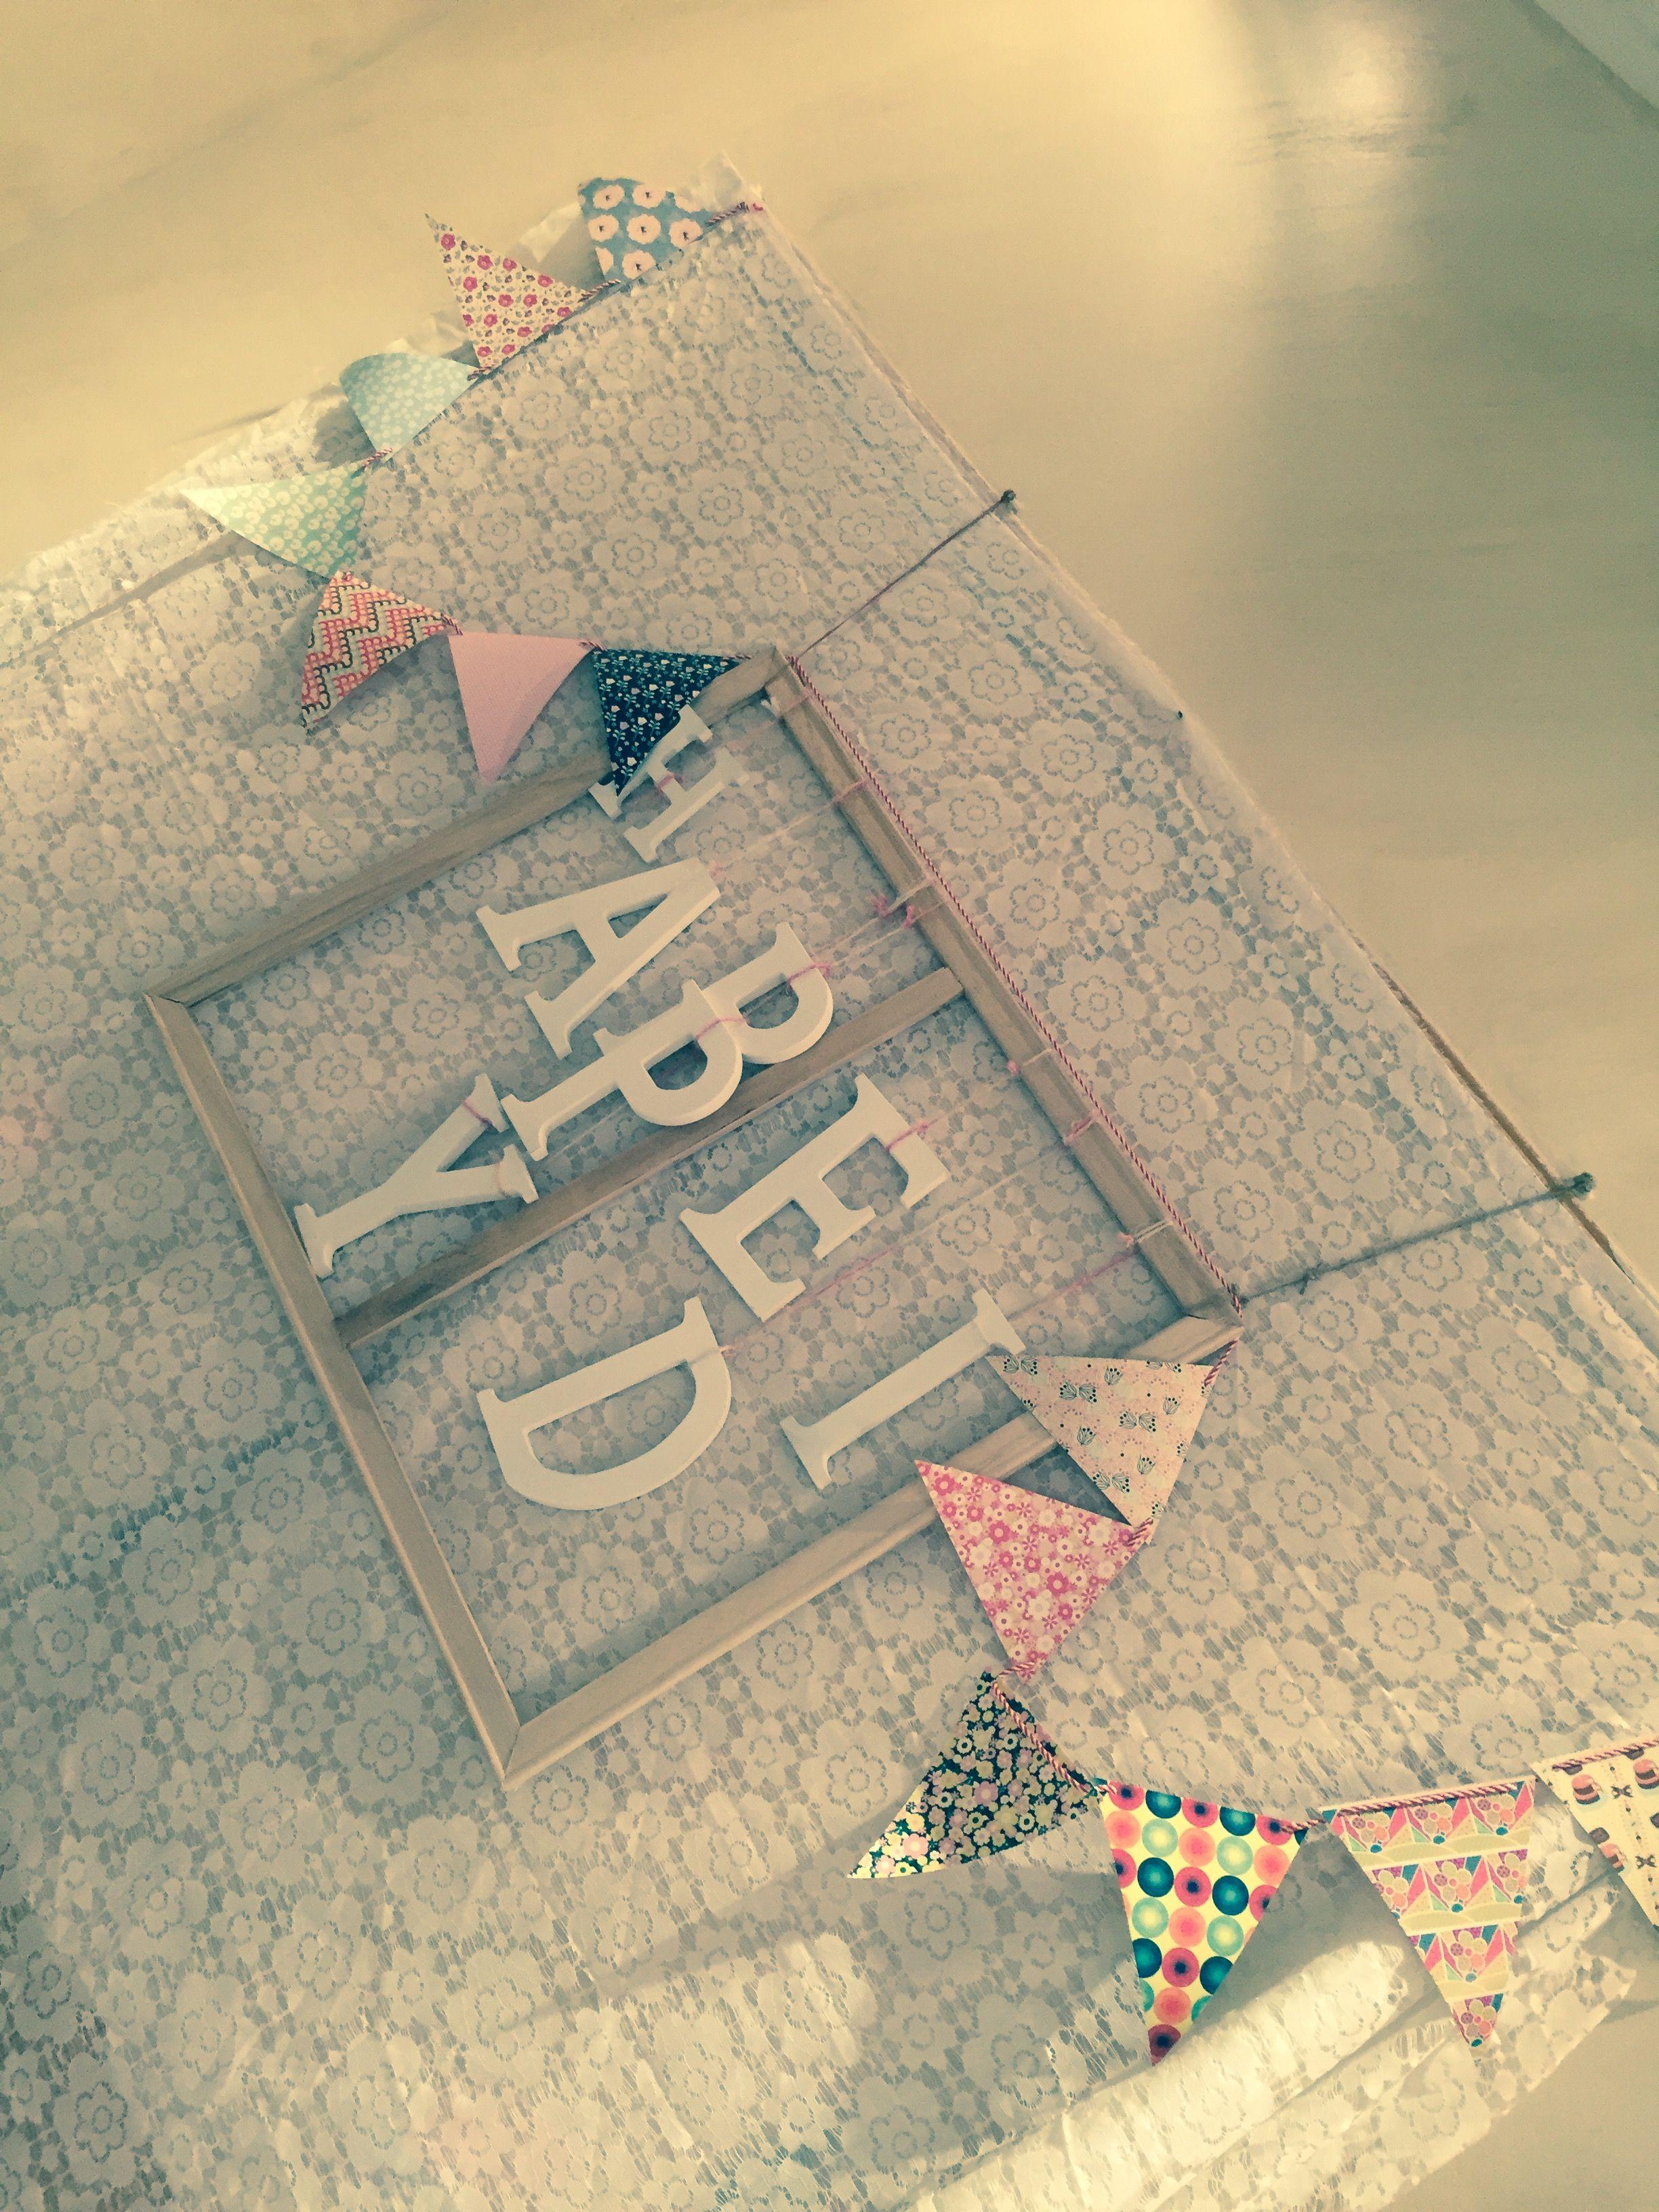 Happy Eid أفكار زينه للعيد ١ احضار ايطار خشبي او اي لوحه قديمه عندكم بايطار فضو الزجاج و استخدموها ٢ الحروف الخشبية ا Journal Planner Planner Diy